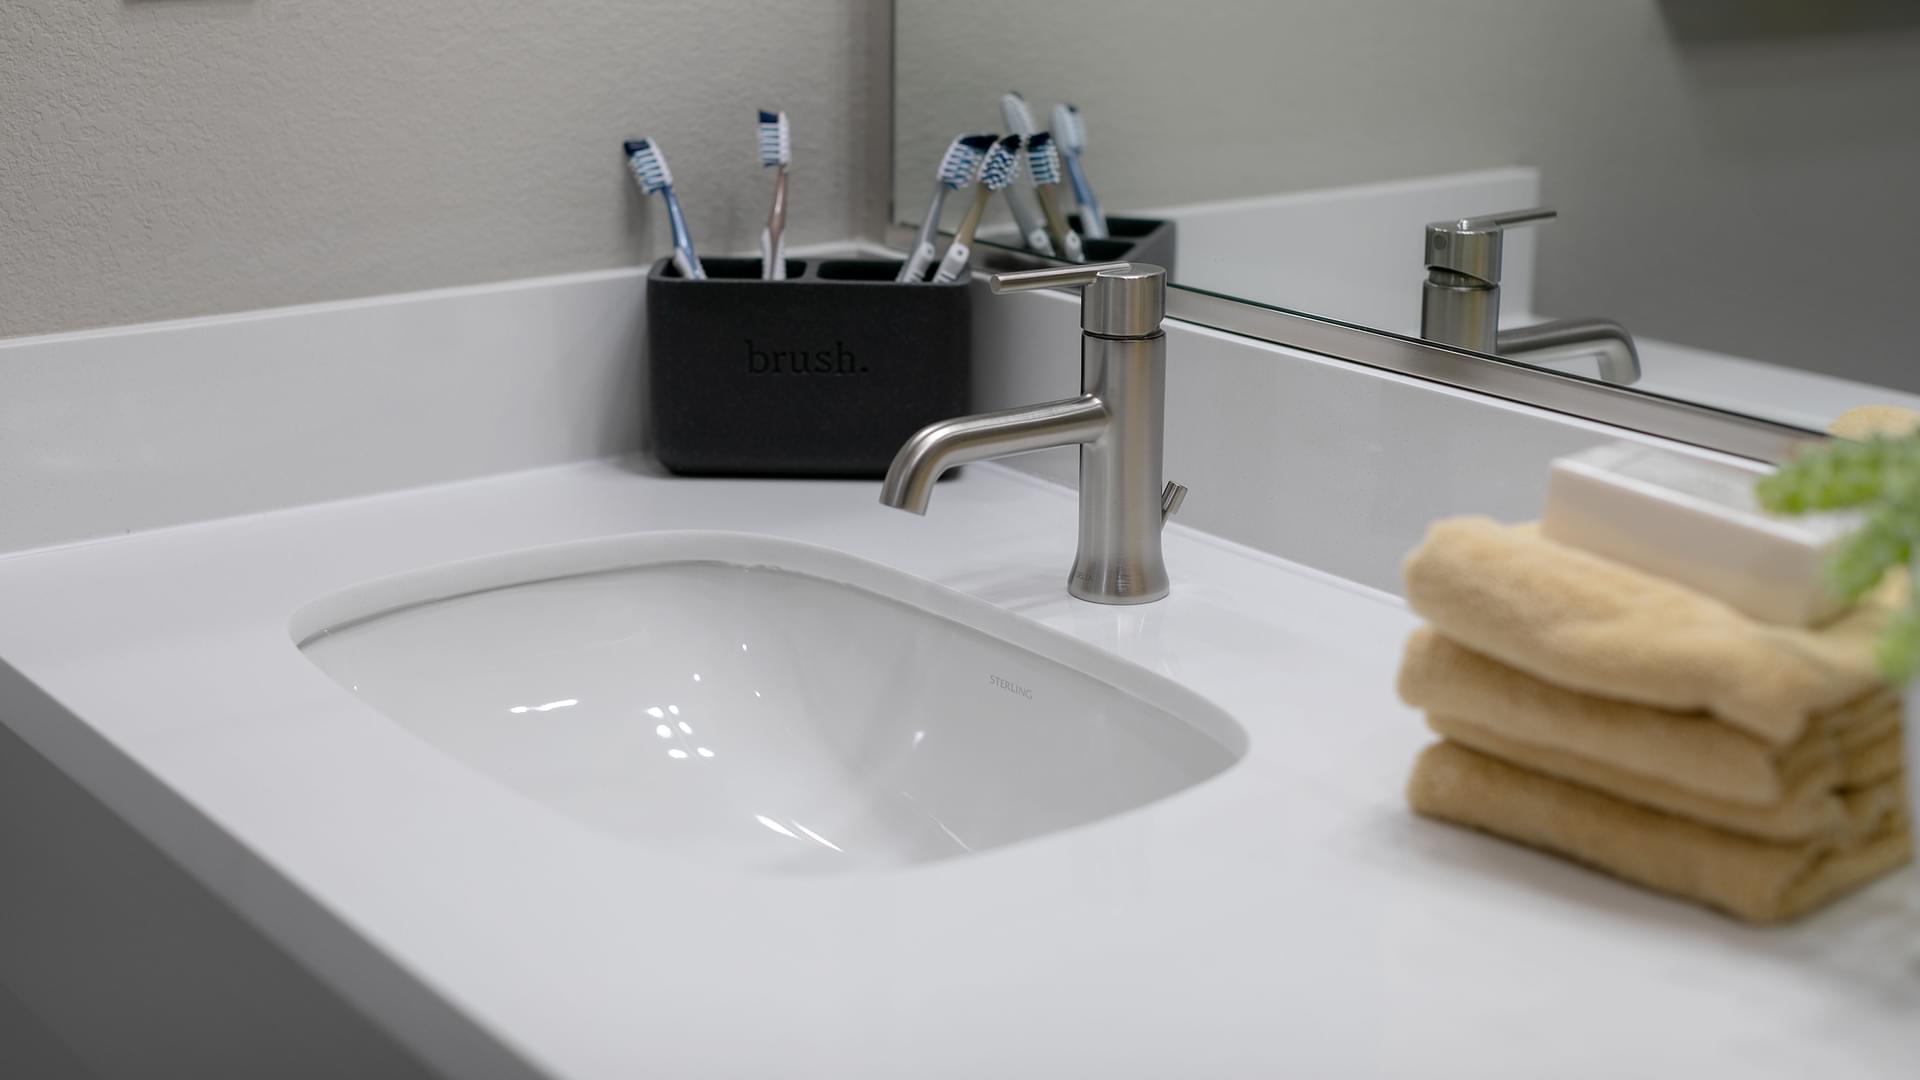 Residence 4 Bath 2